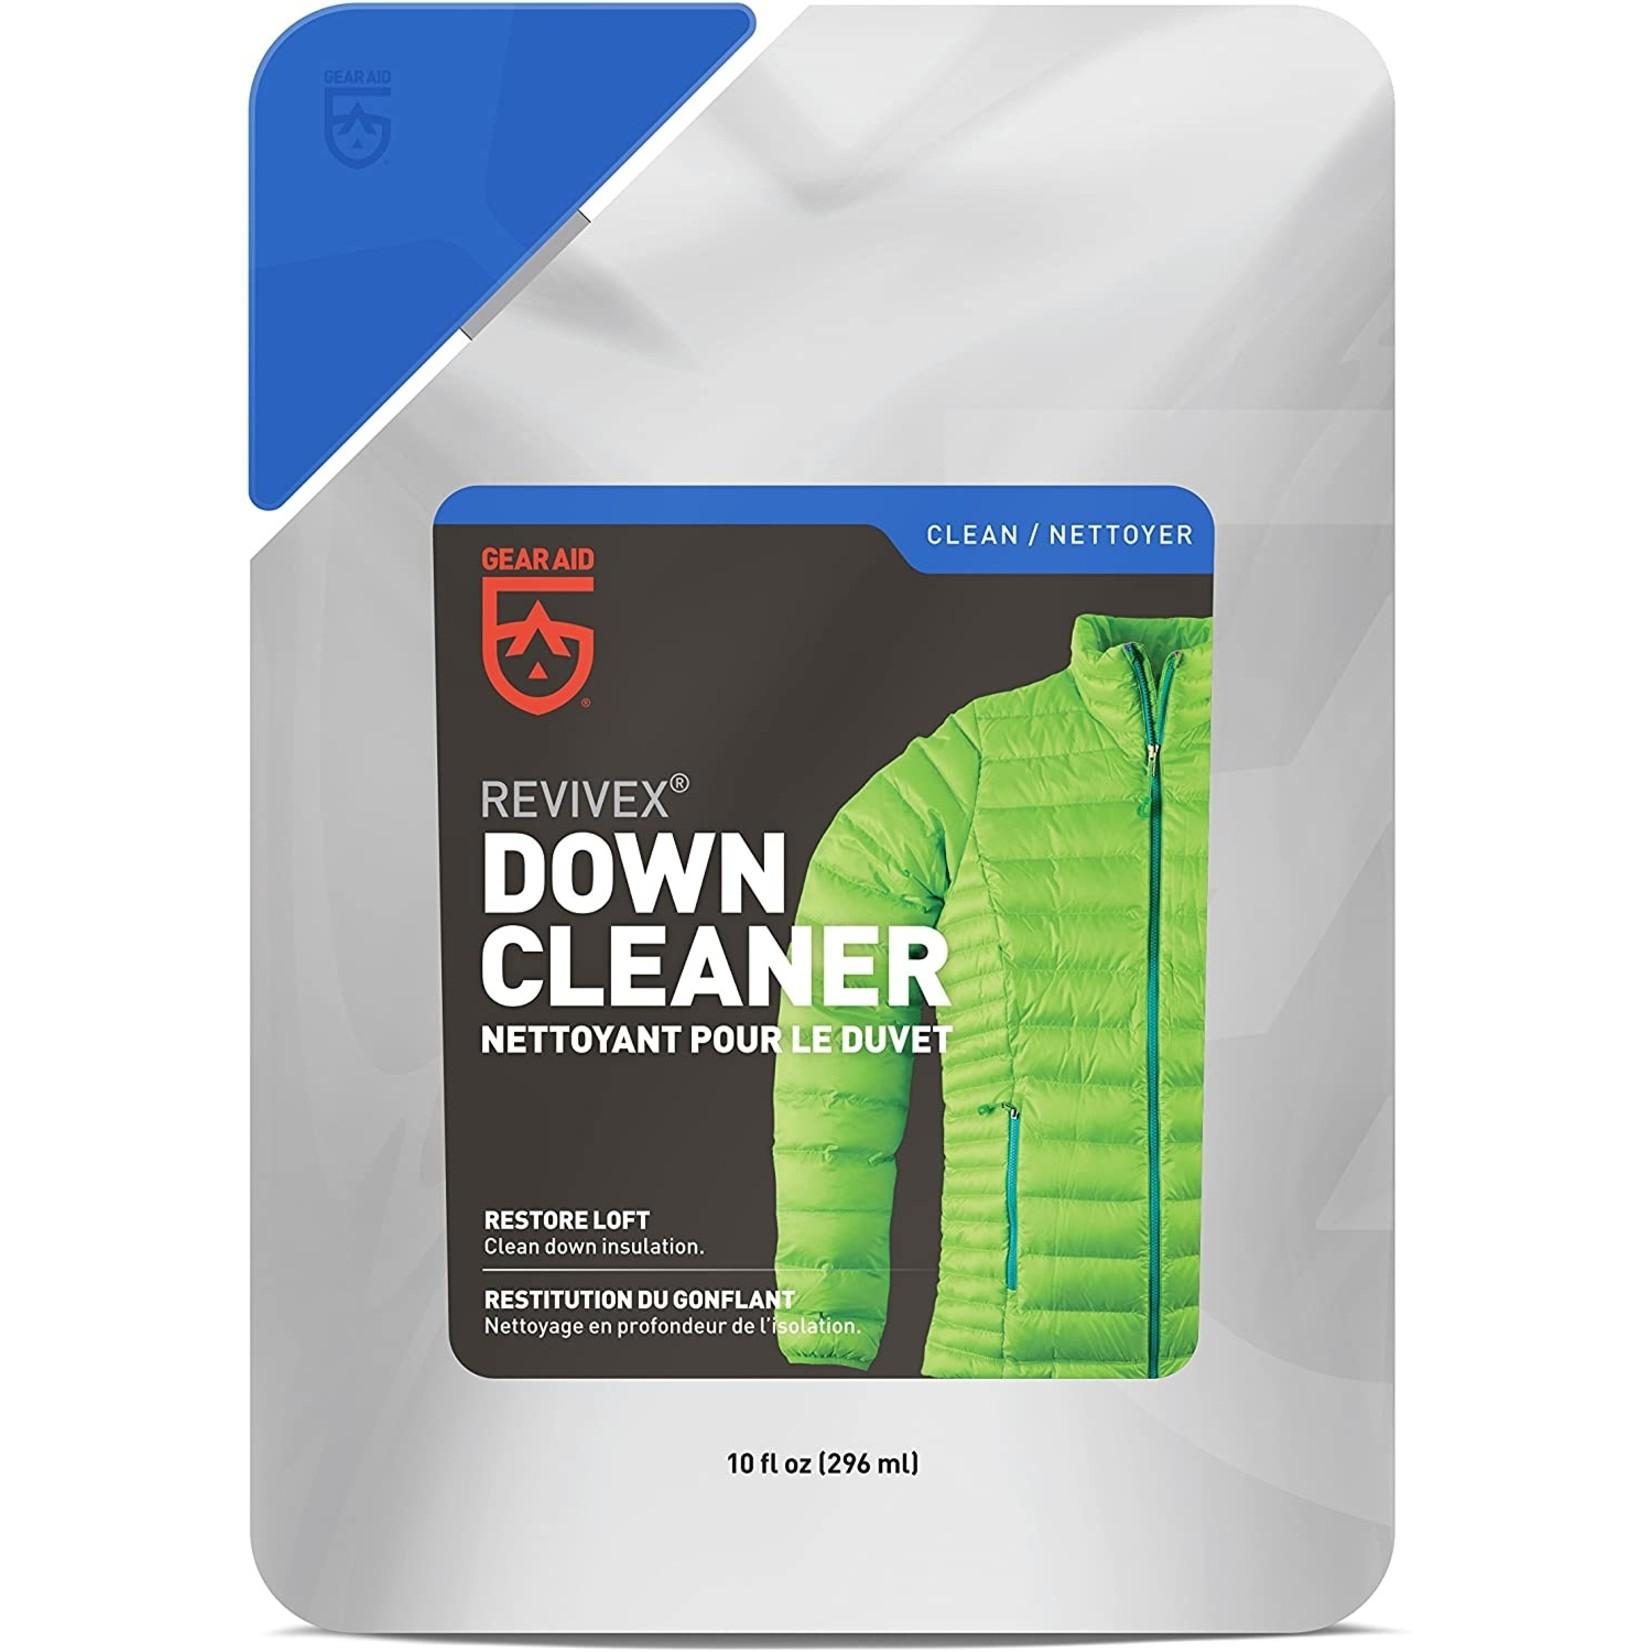 Revivex Down Cleaner